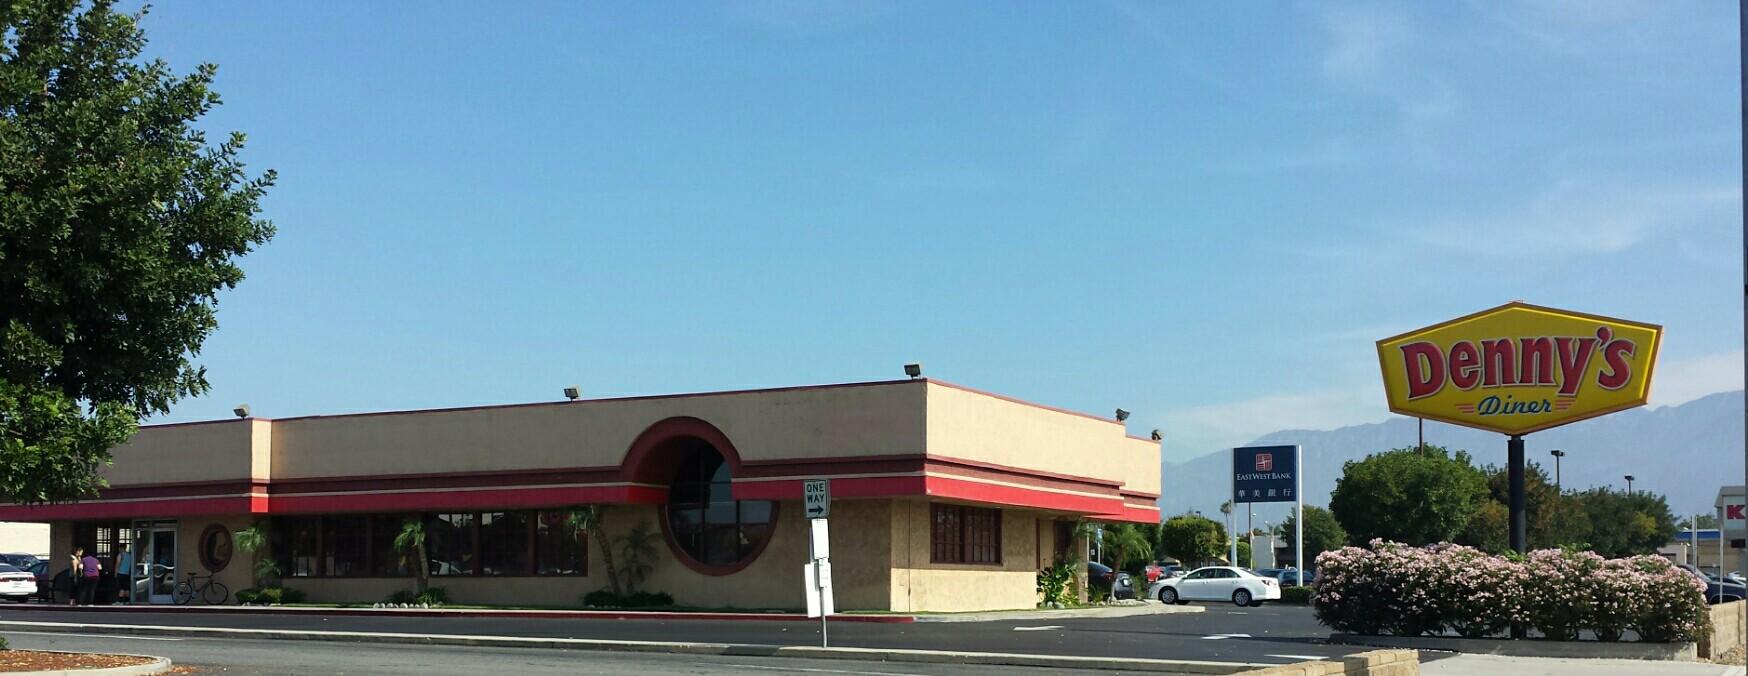 Denny's, Temple City CA